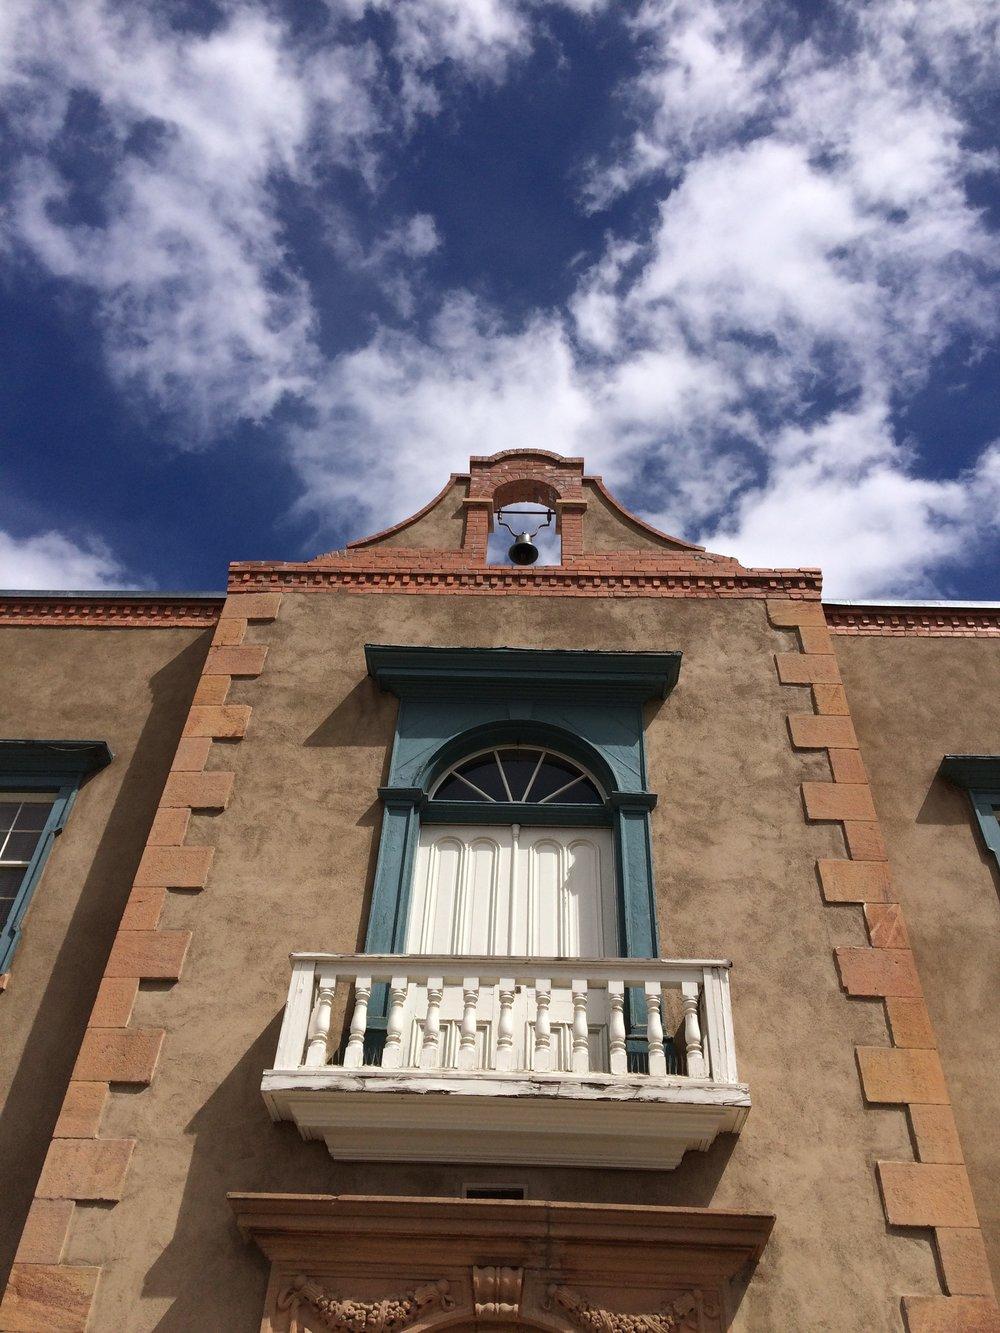 St. Michael's Dormitory